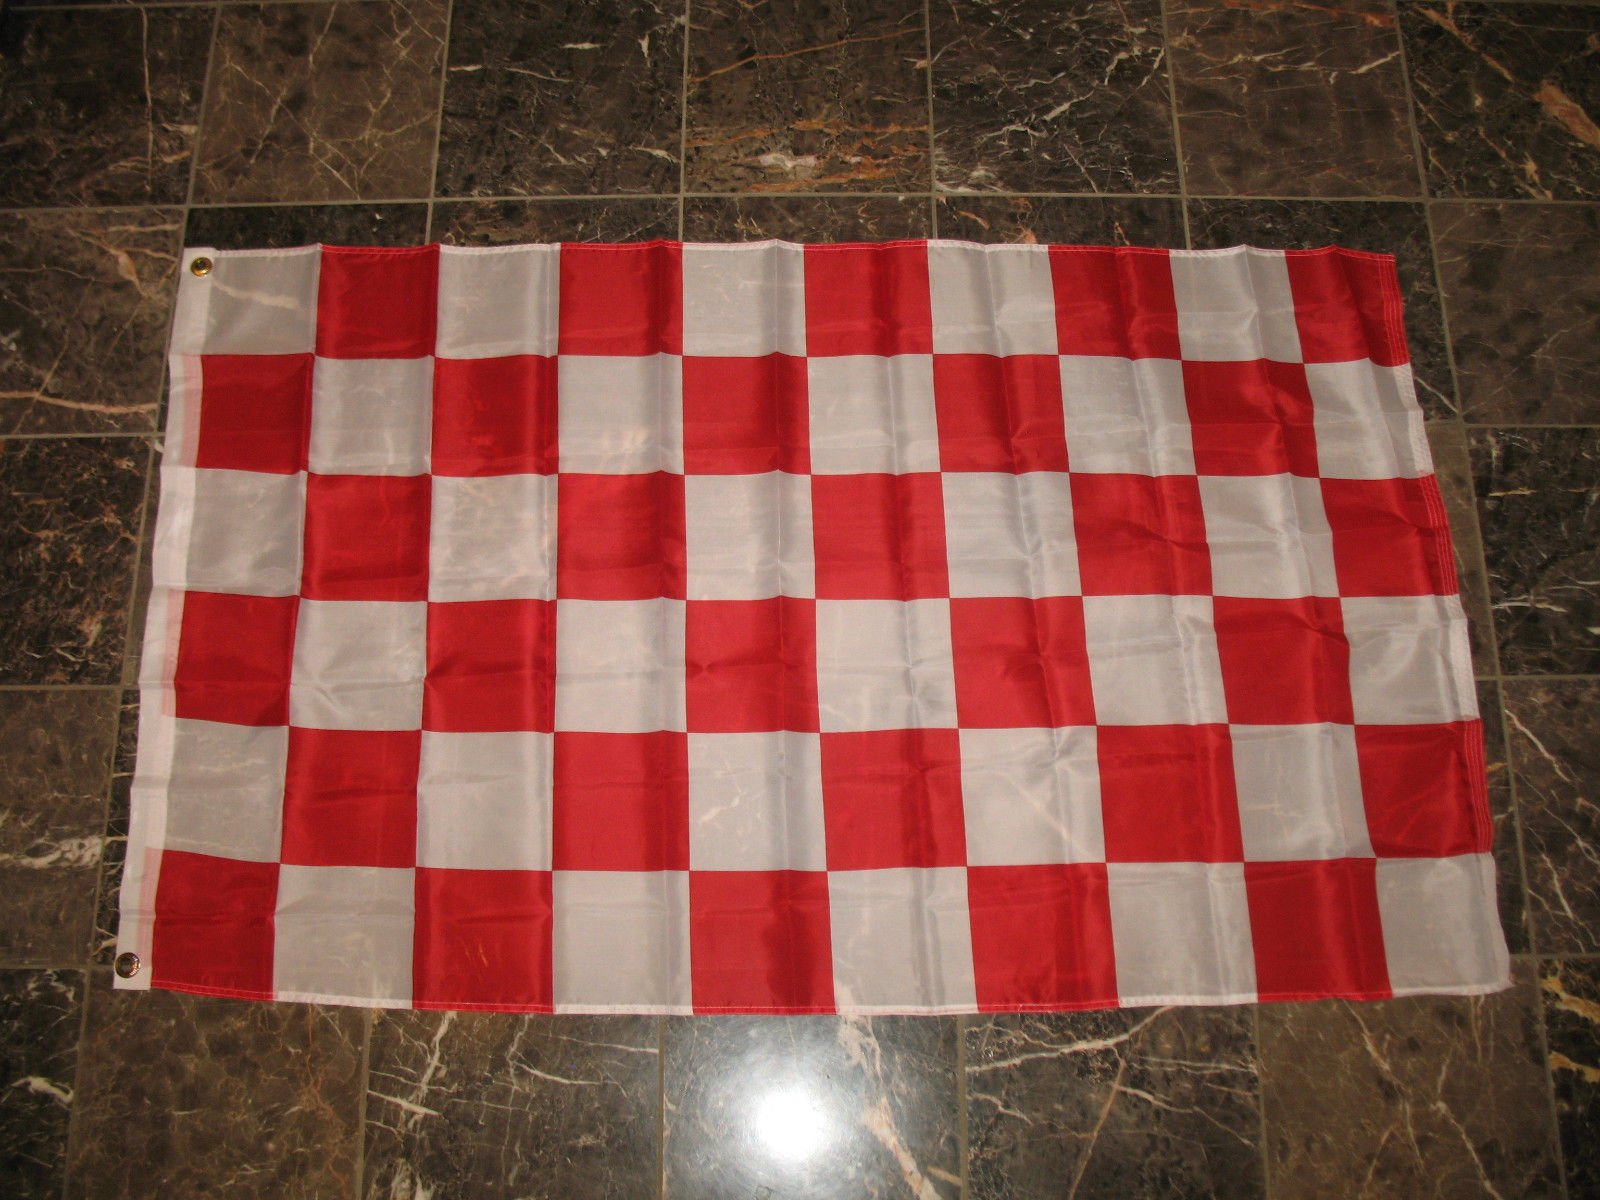 3X5 Advertising Checkered Checker Red White Flag